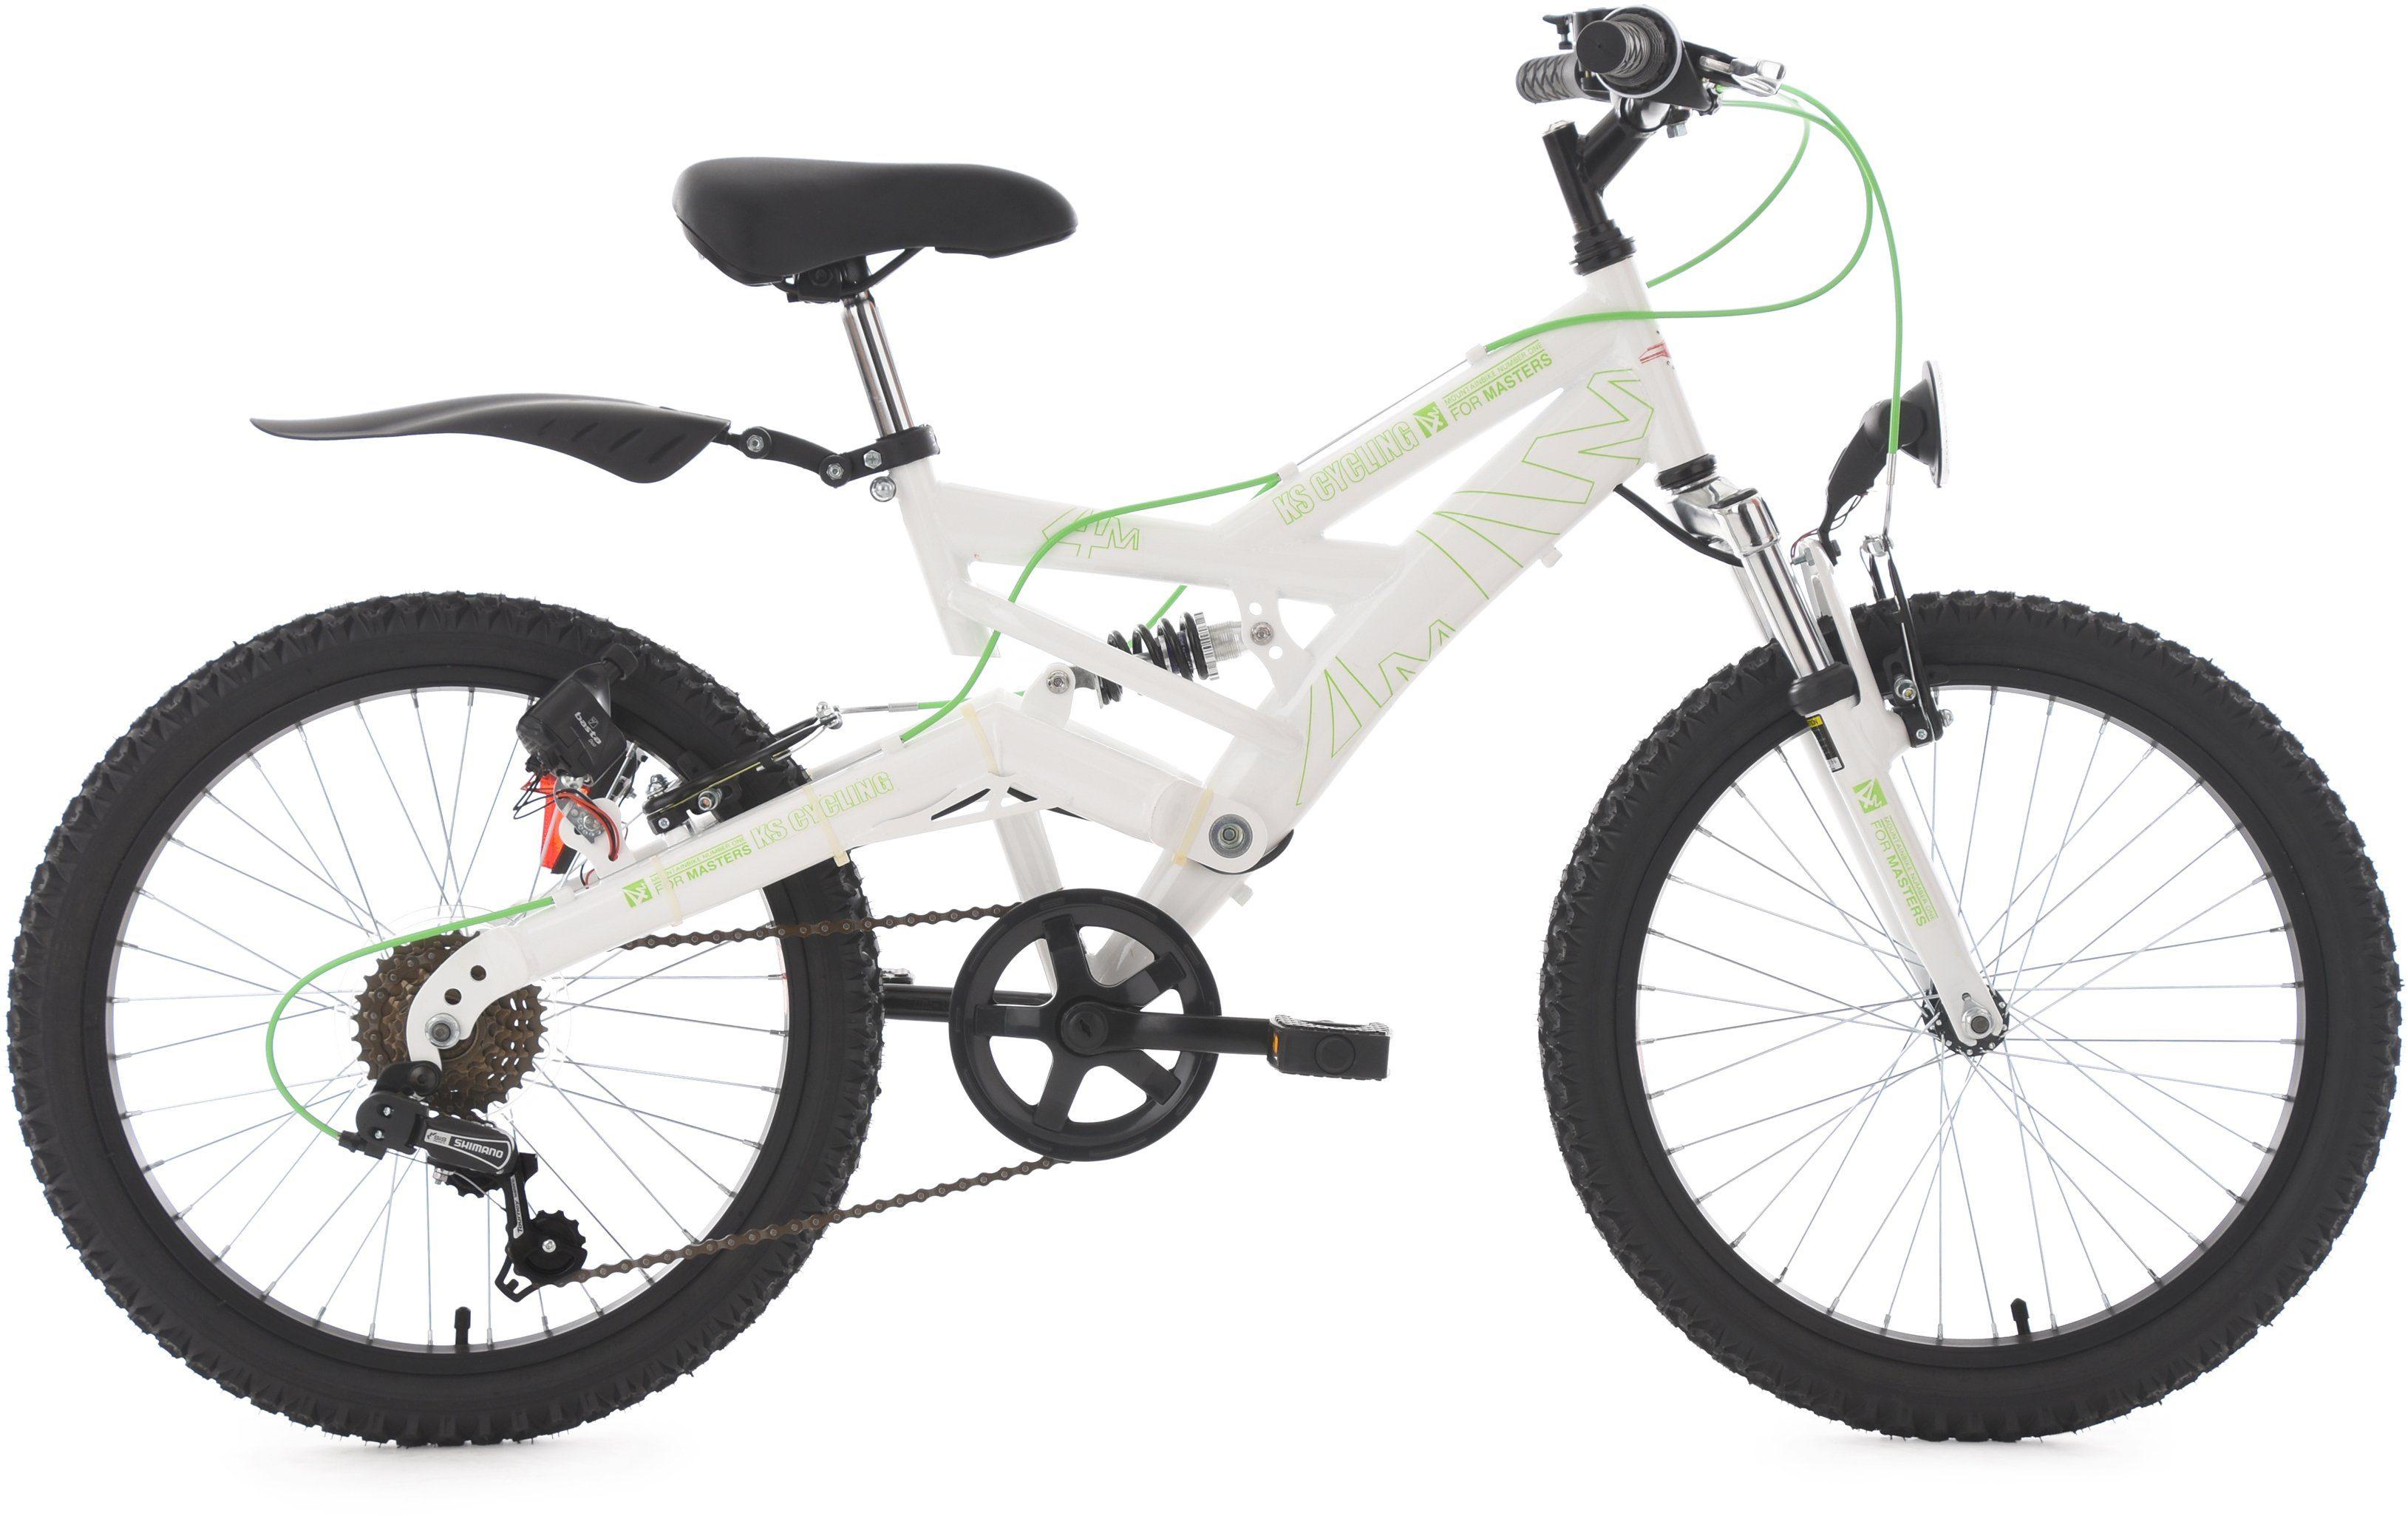 KS Cycling Jugendfahrrad, 20 Zoll, weiß-grün, Shimano 6 Gang-Kettenschaltung, »4Masters«